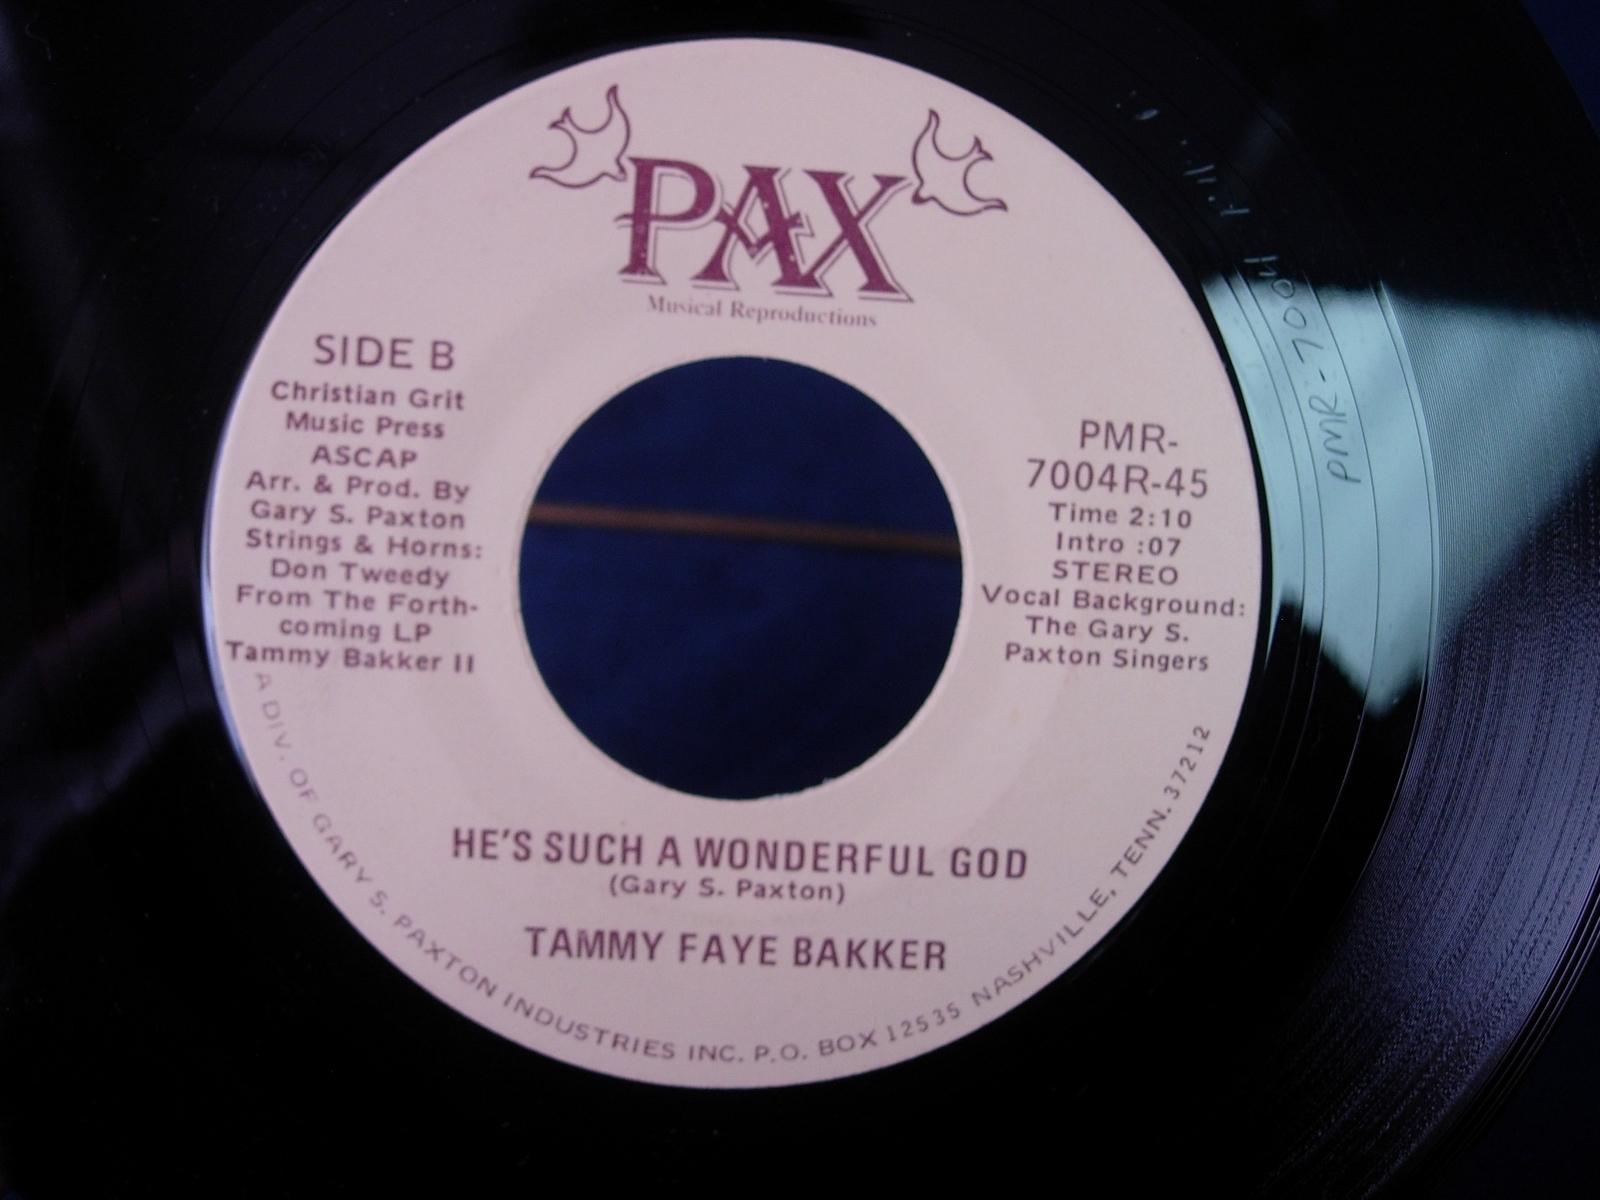 Tammy Faye Bakker - Jesus / He's Such a Wonderful God - PAX PMR-7004R